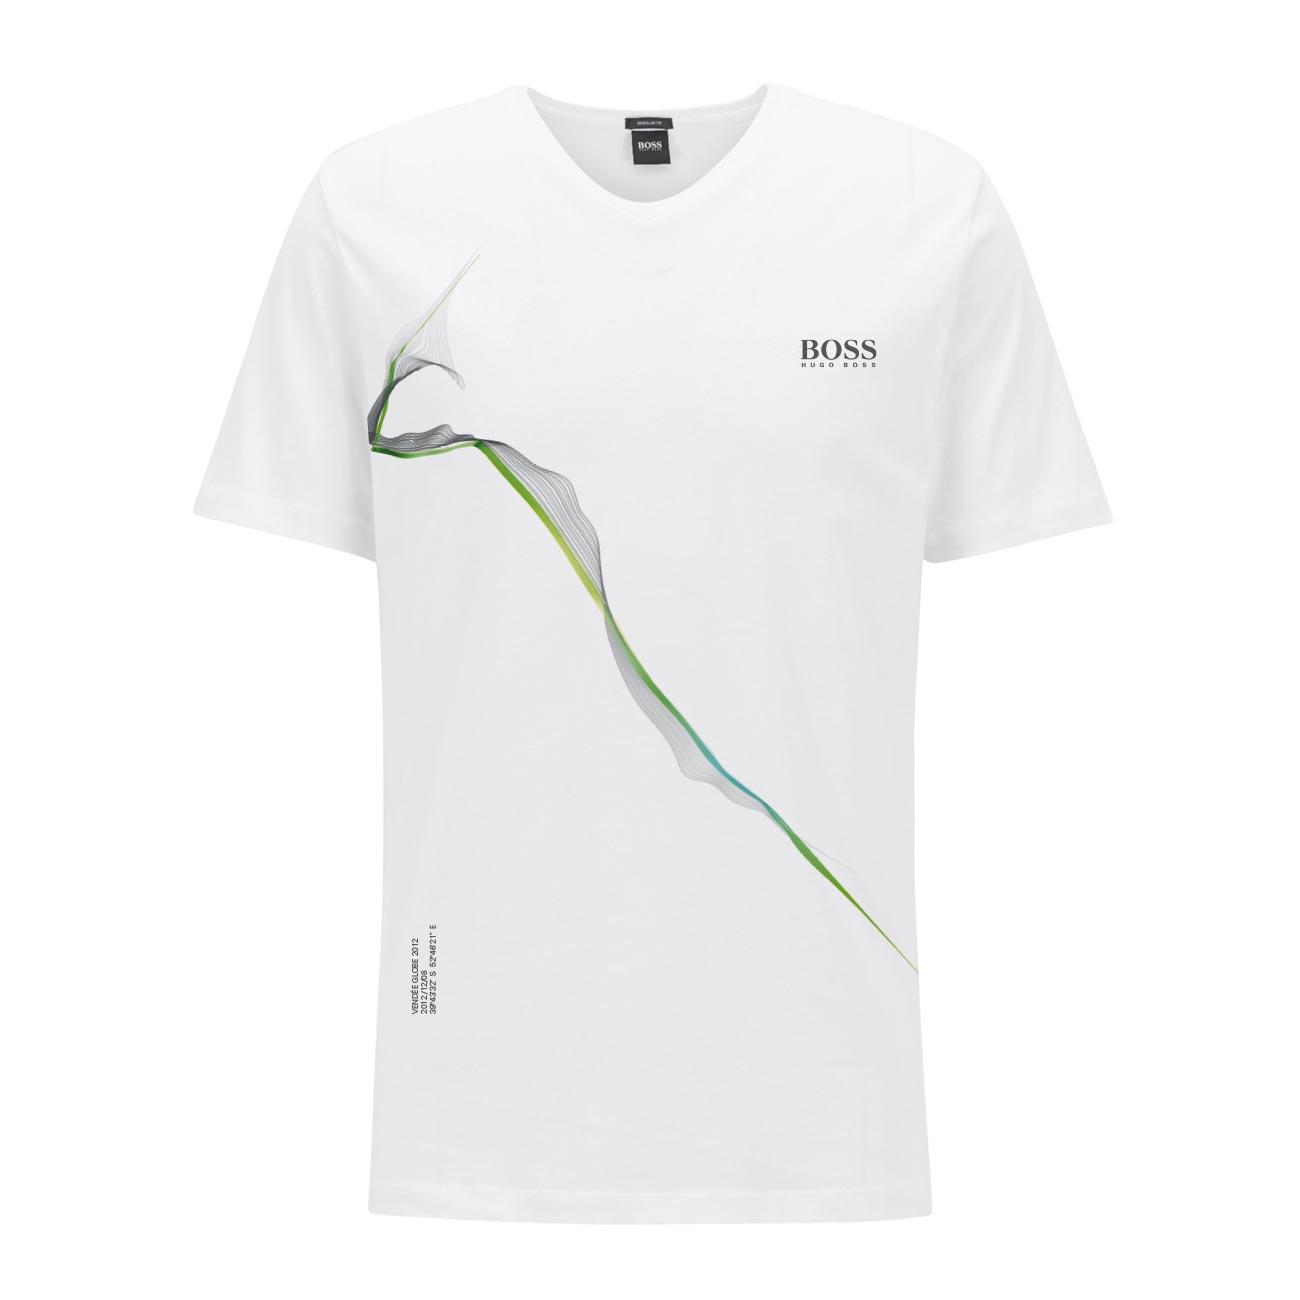 HUGOBOSS-Vendee-Globe-Shirt-04